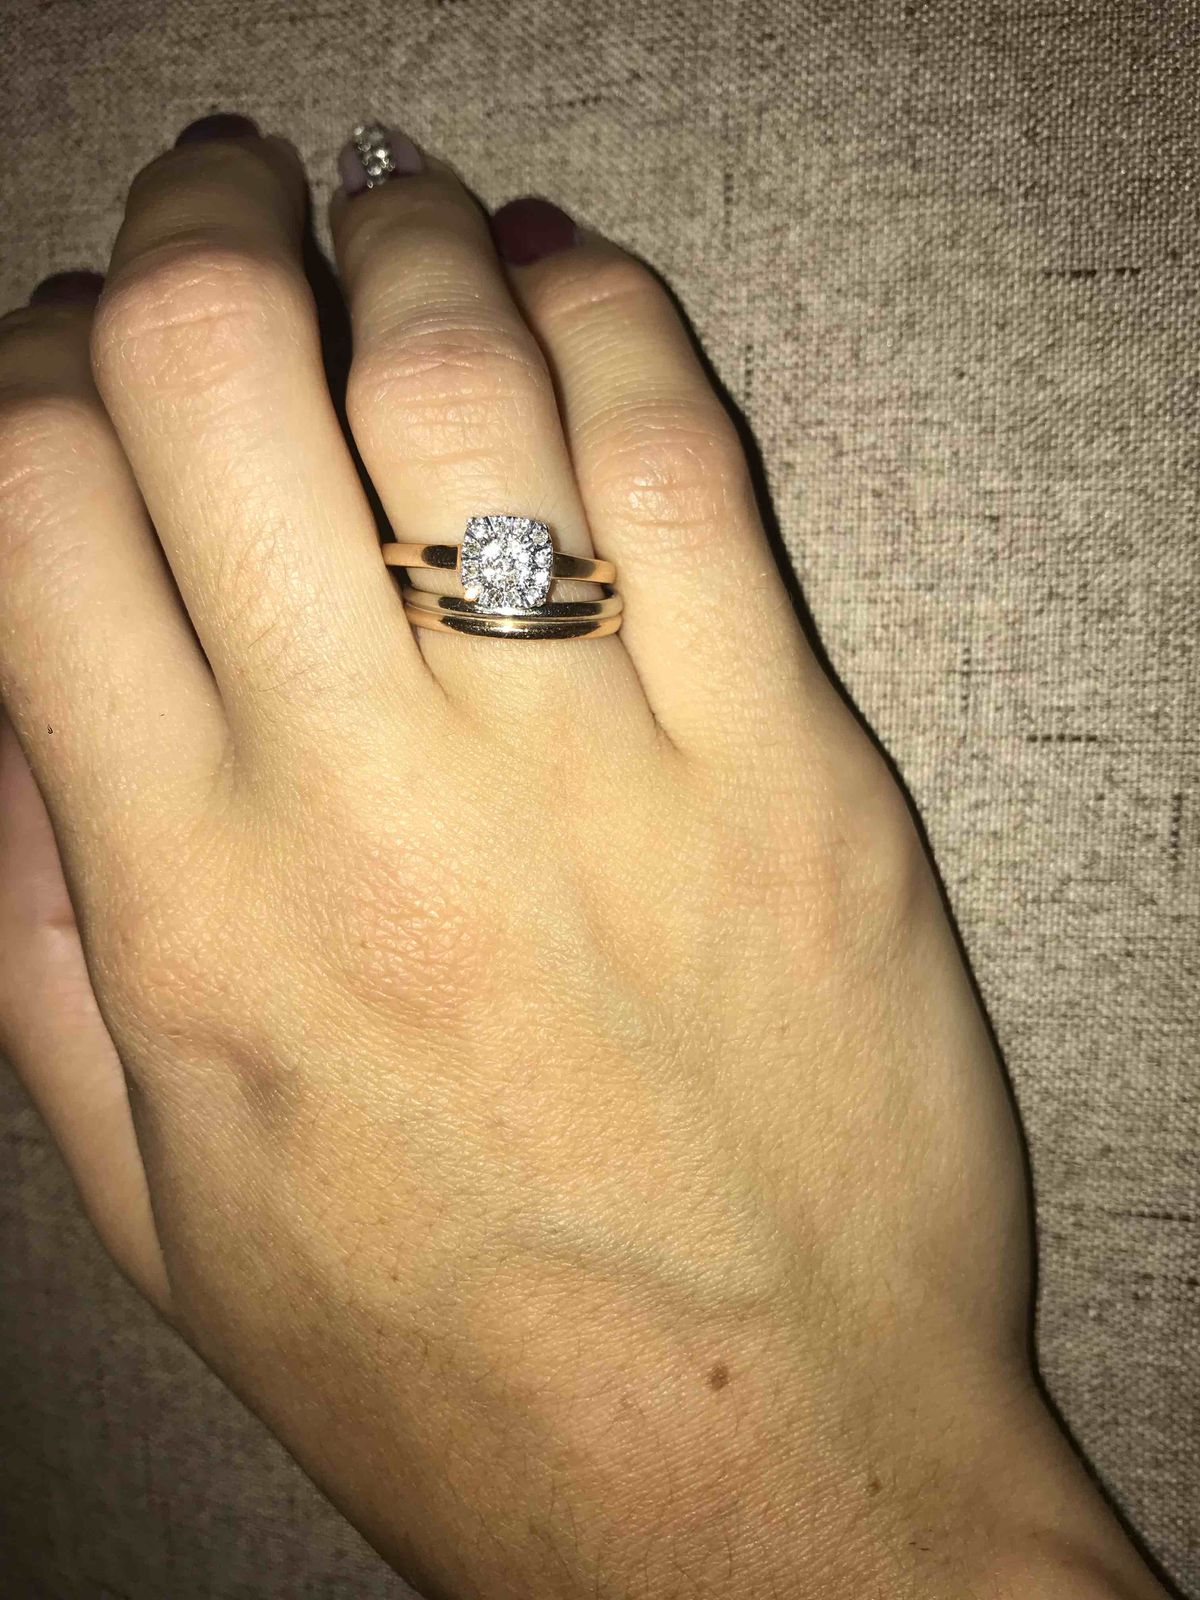 Красивое кольцо. рекомендую!